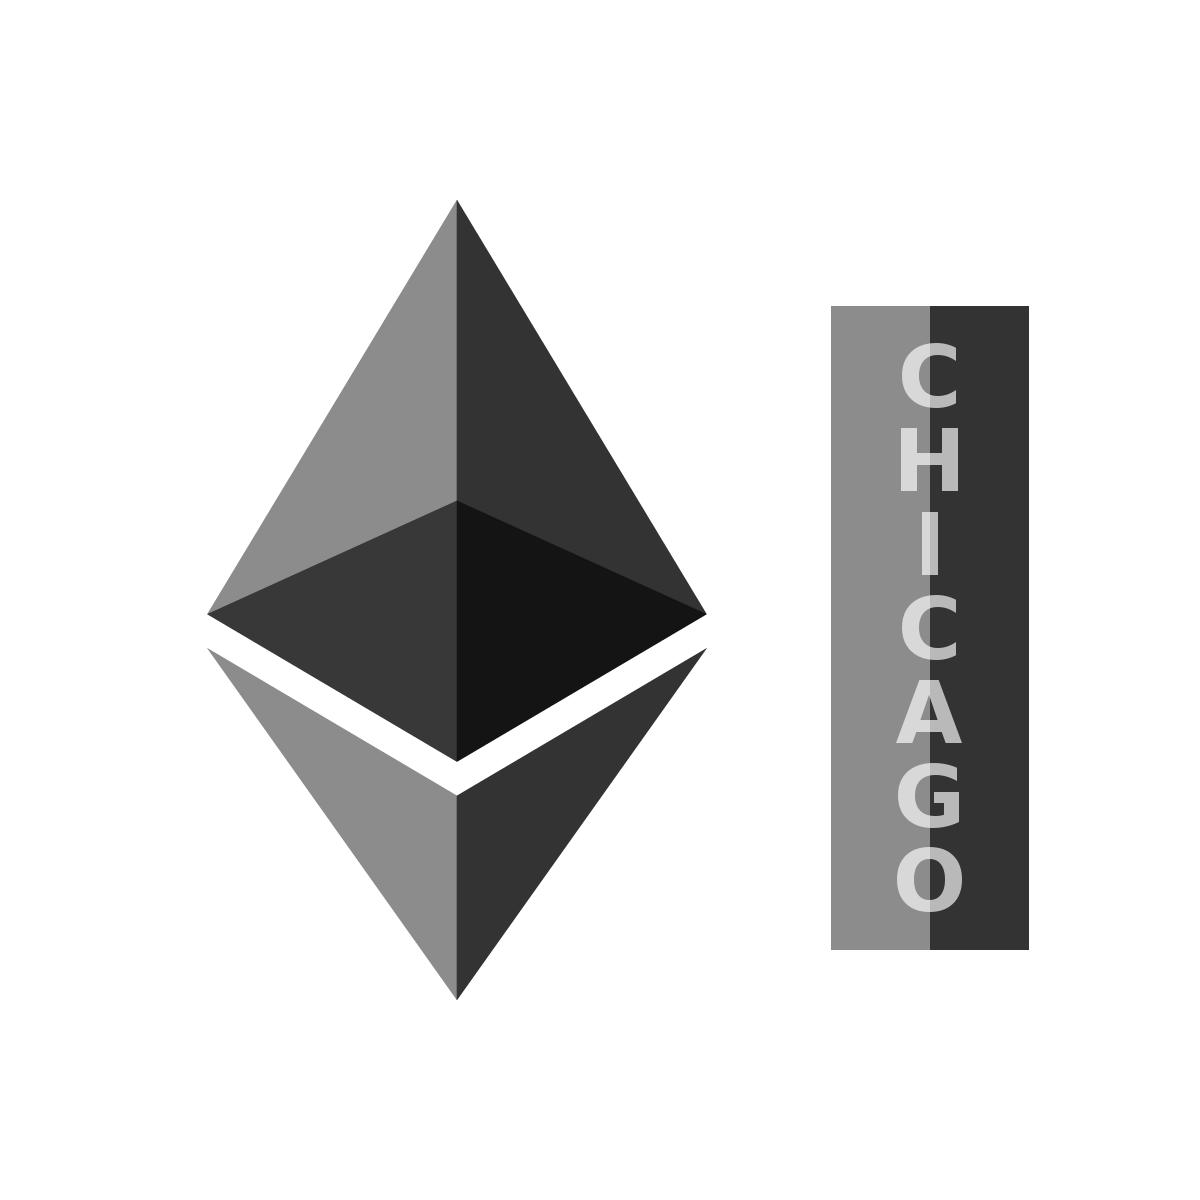 Chicago Ethereum Meetup